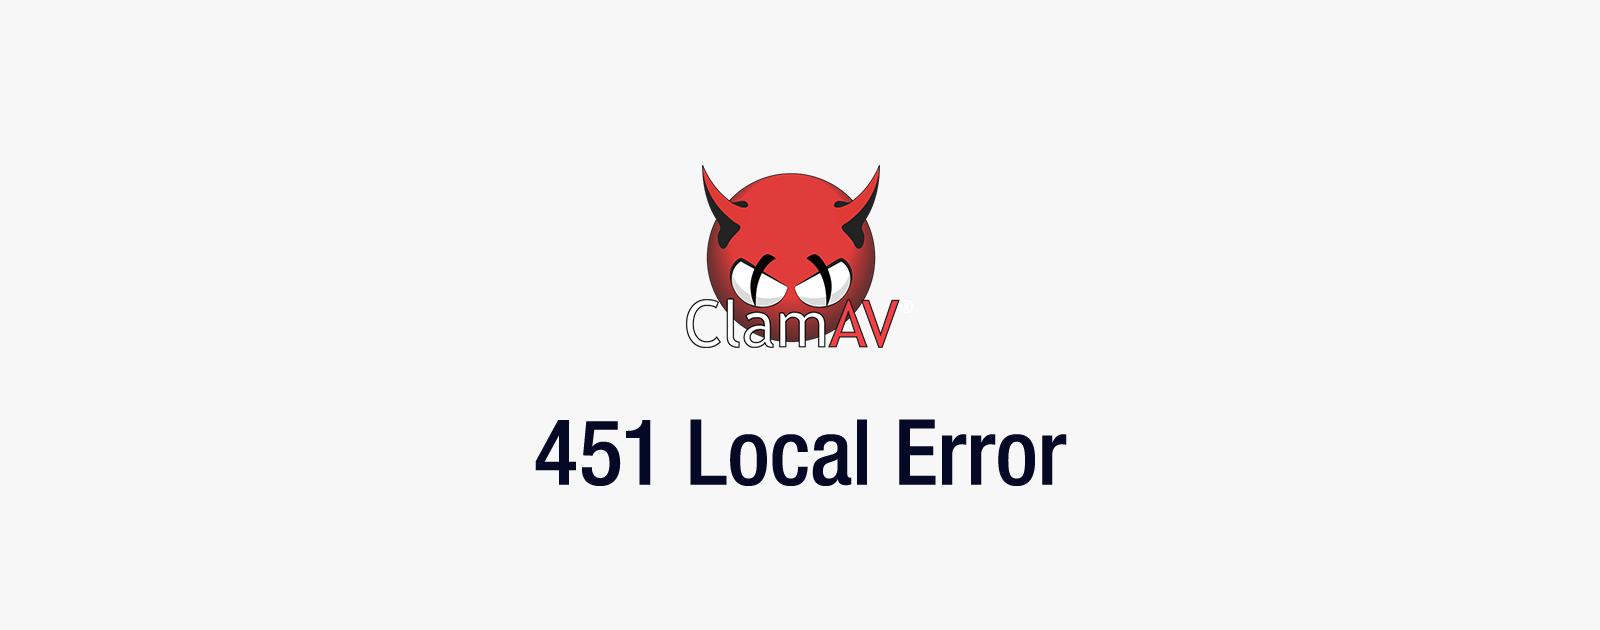 curl_setoptでSSL connect errorが出て接続に失敗する場合の対処法